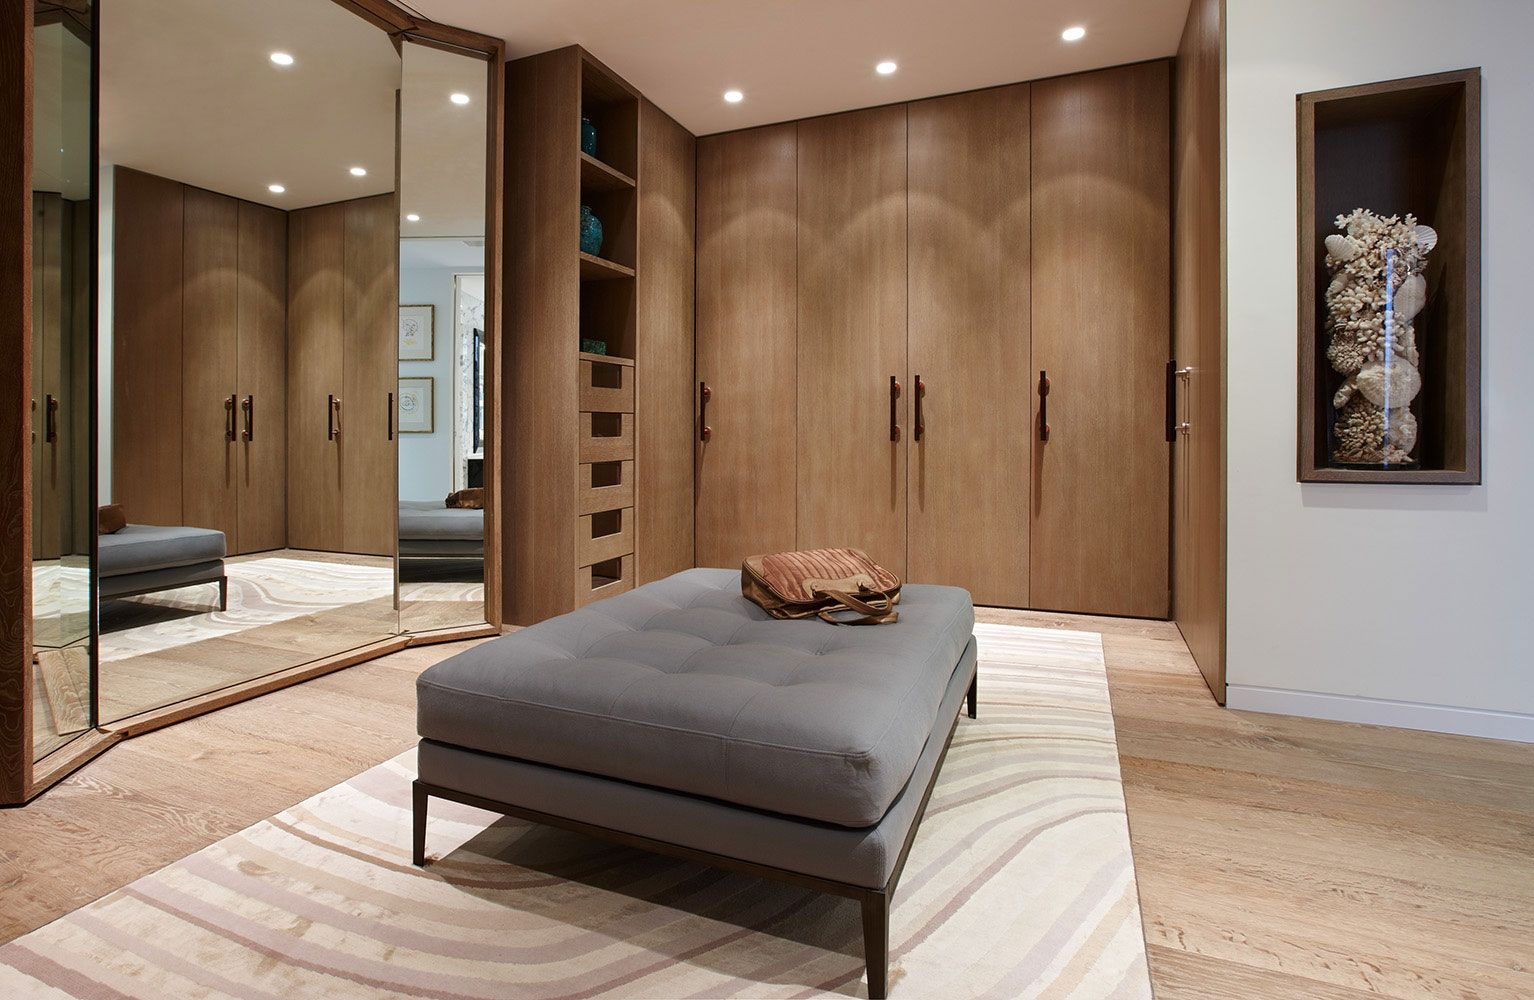 Tara bernerd u partners dream home master bedroom pinterest